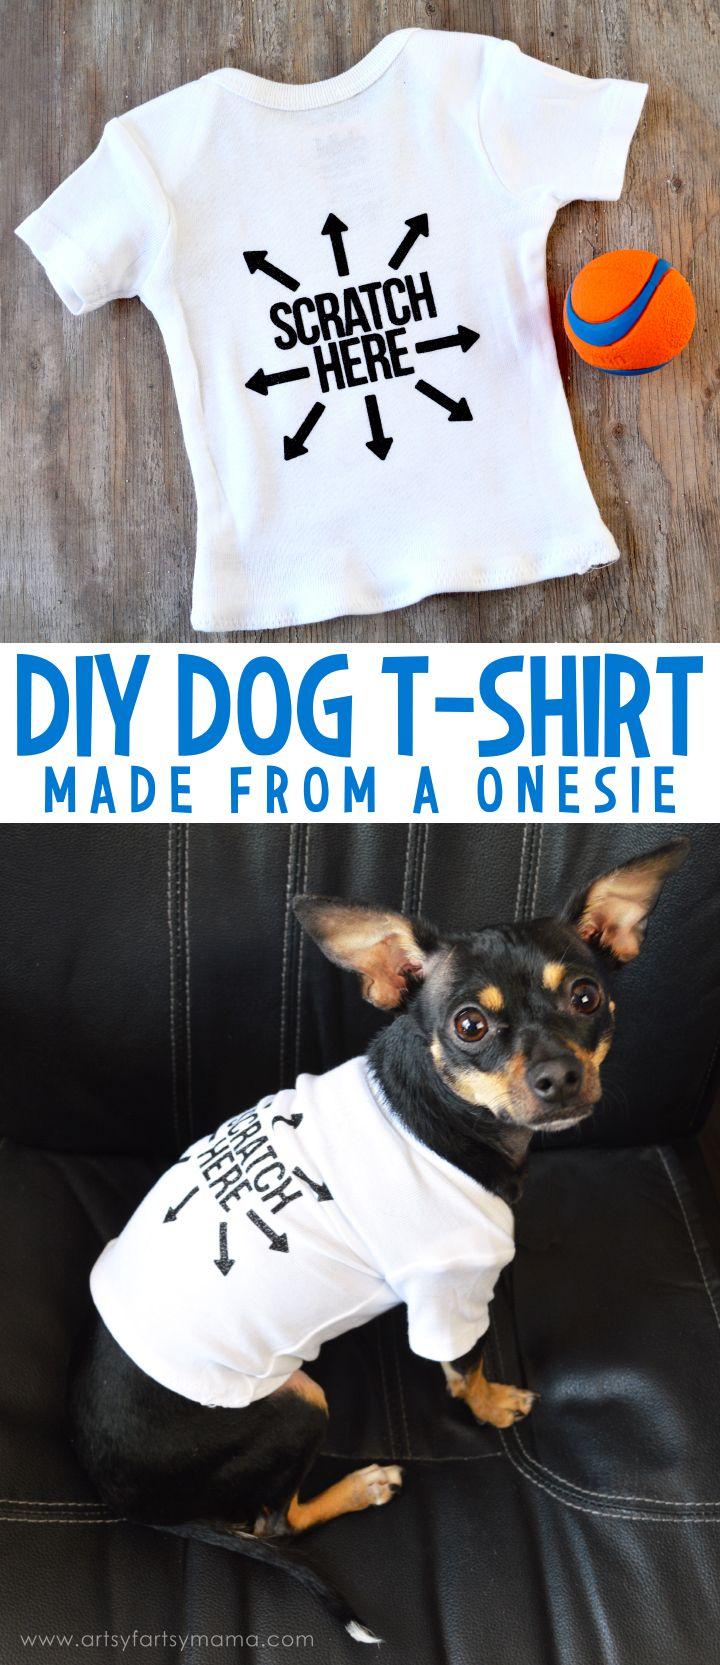 Diy dog tshirt puppy clothes dog clothes patterns